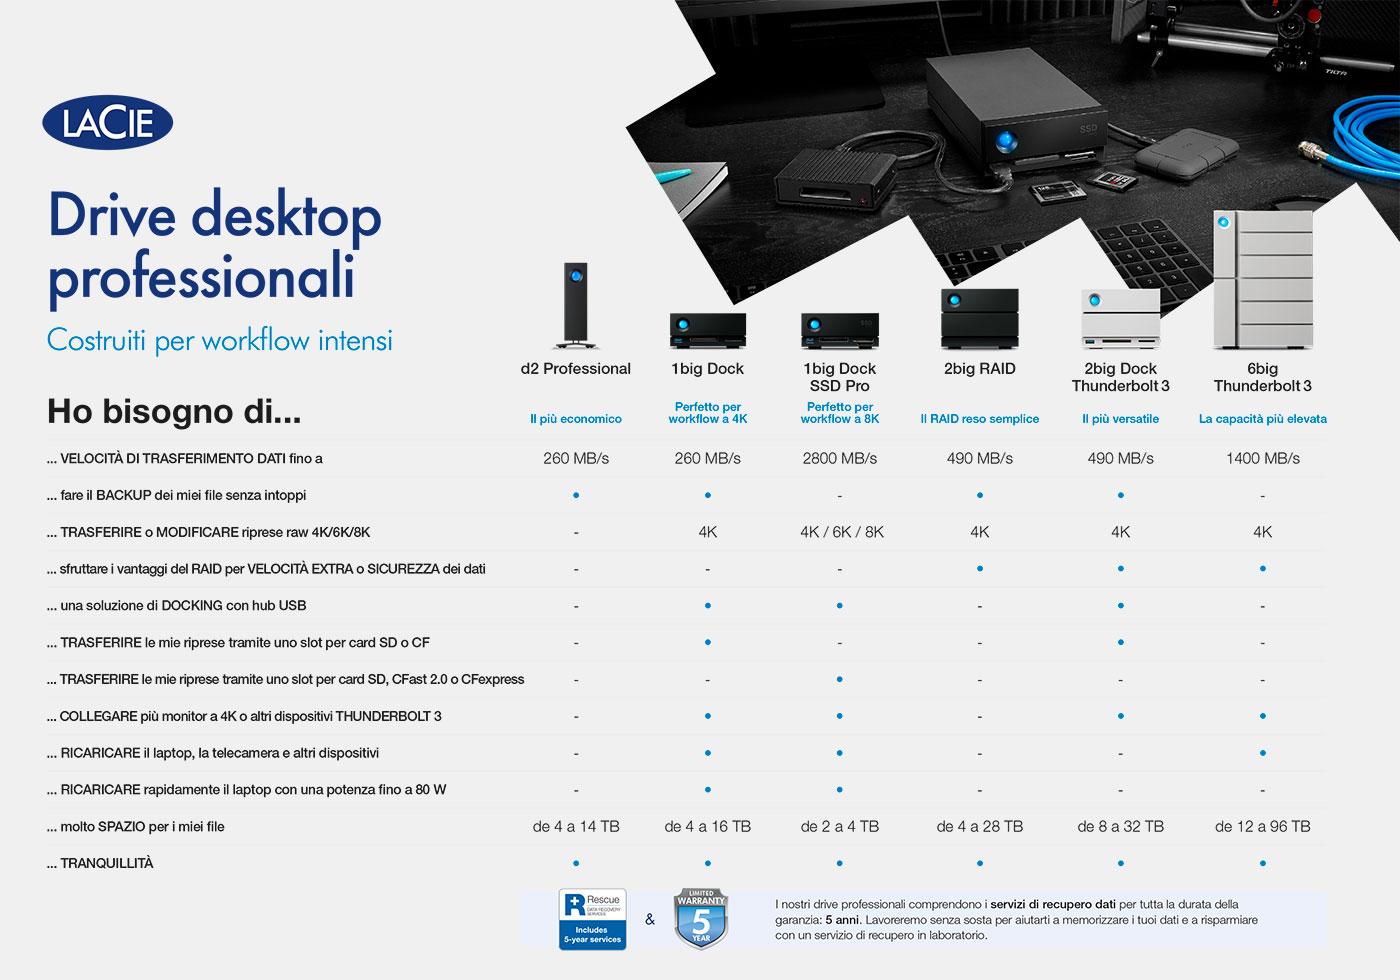 lacie drive desktop professionali